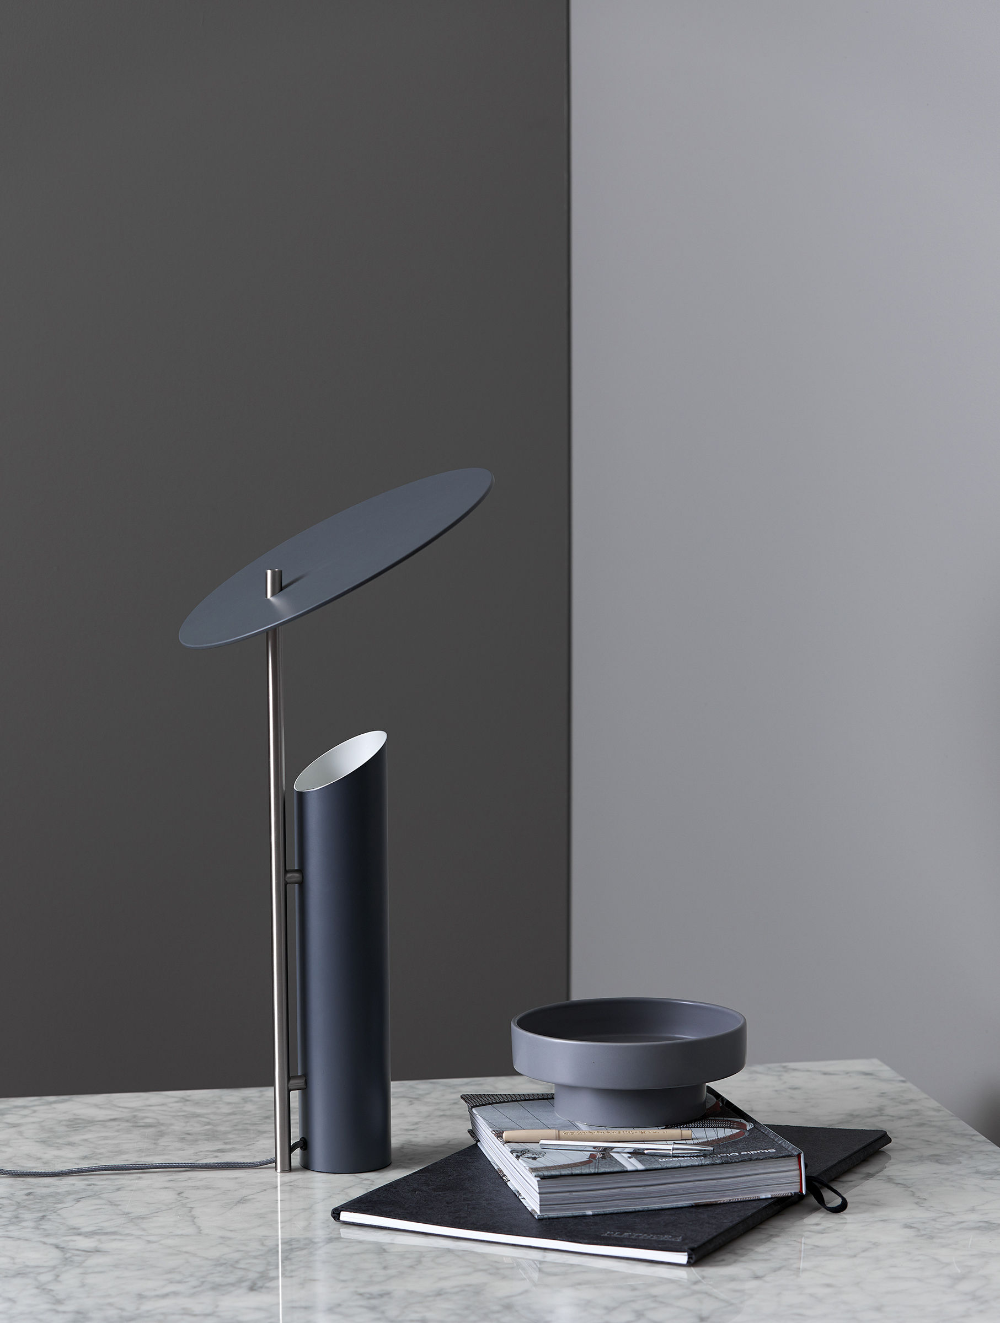 Lampe De Table Reflect Verpan Rouge Made In Design Lampe De Table Moderne Lampes Salon Lampe Design